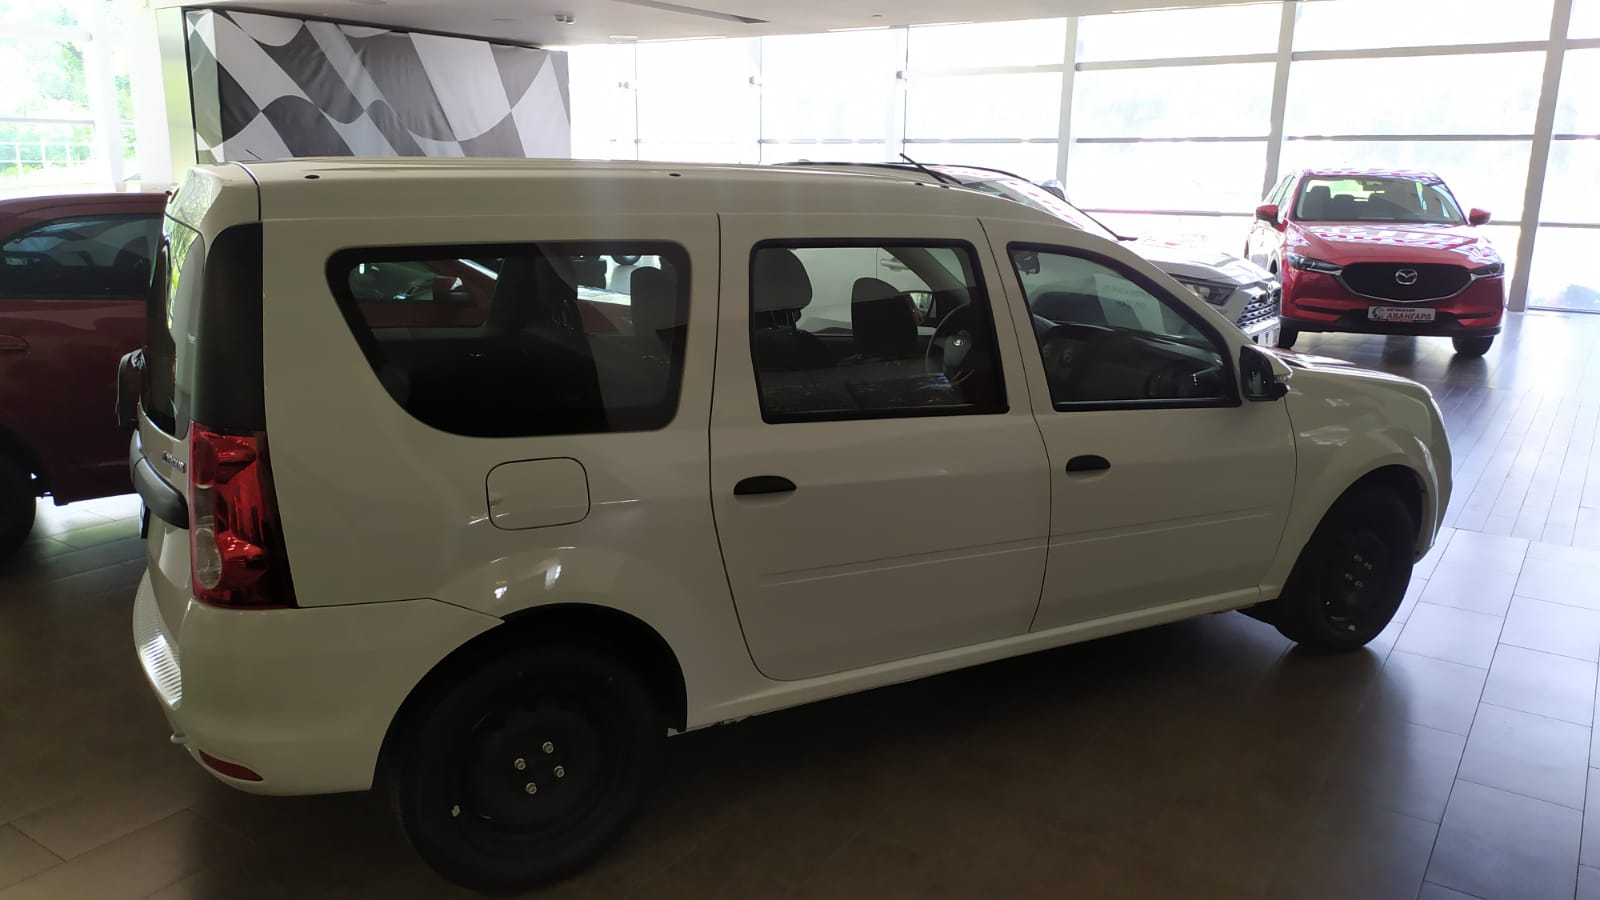 Lada Largus 1.6 л 8-кл. 5МТ, 5мест. Классик старт плюс, Белый, 2021